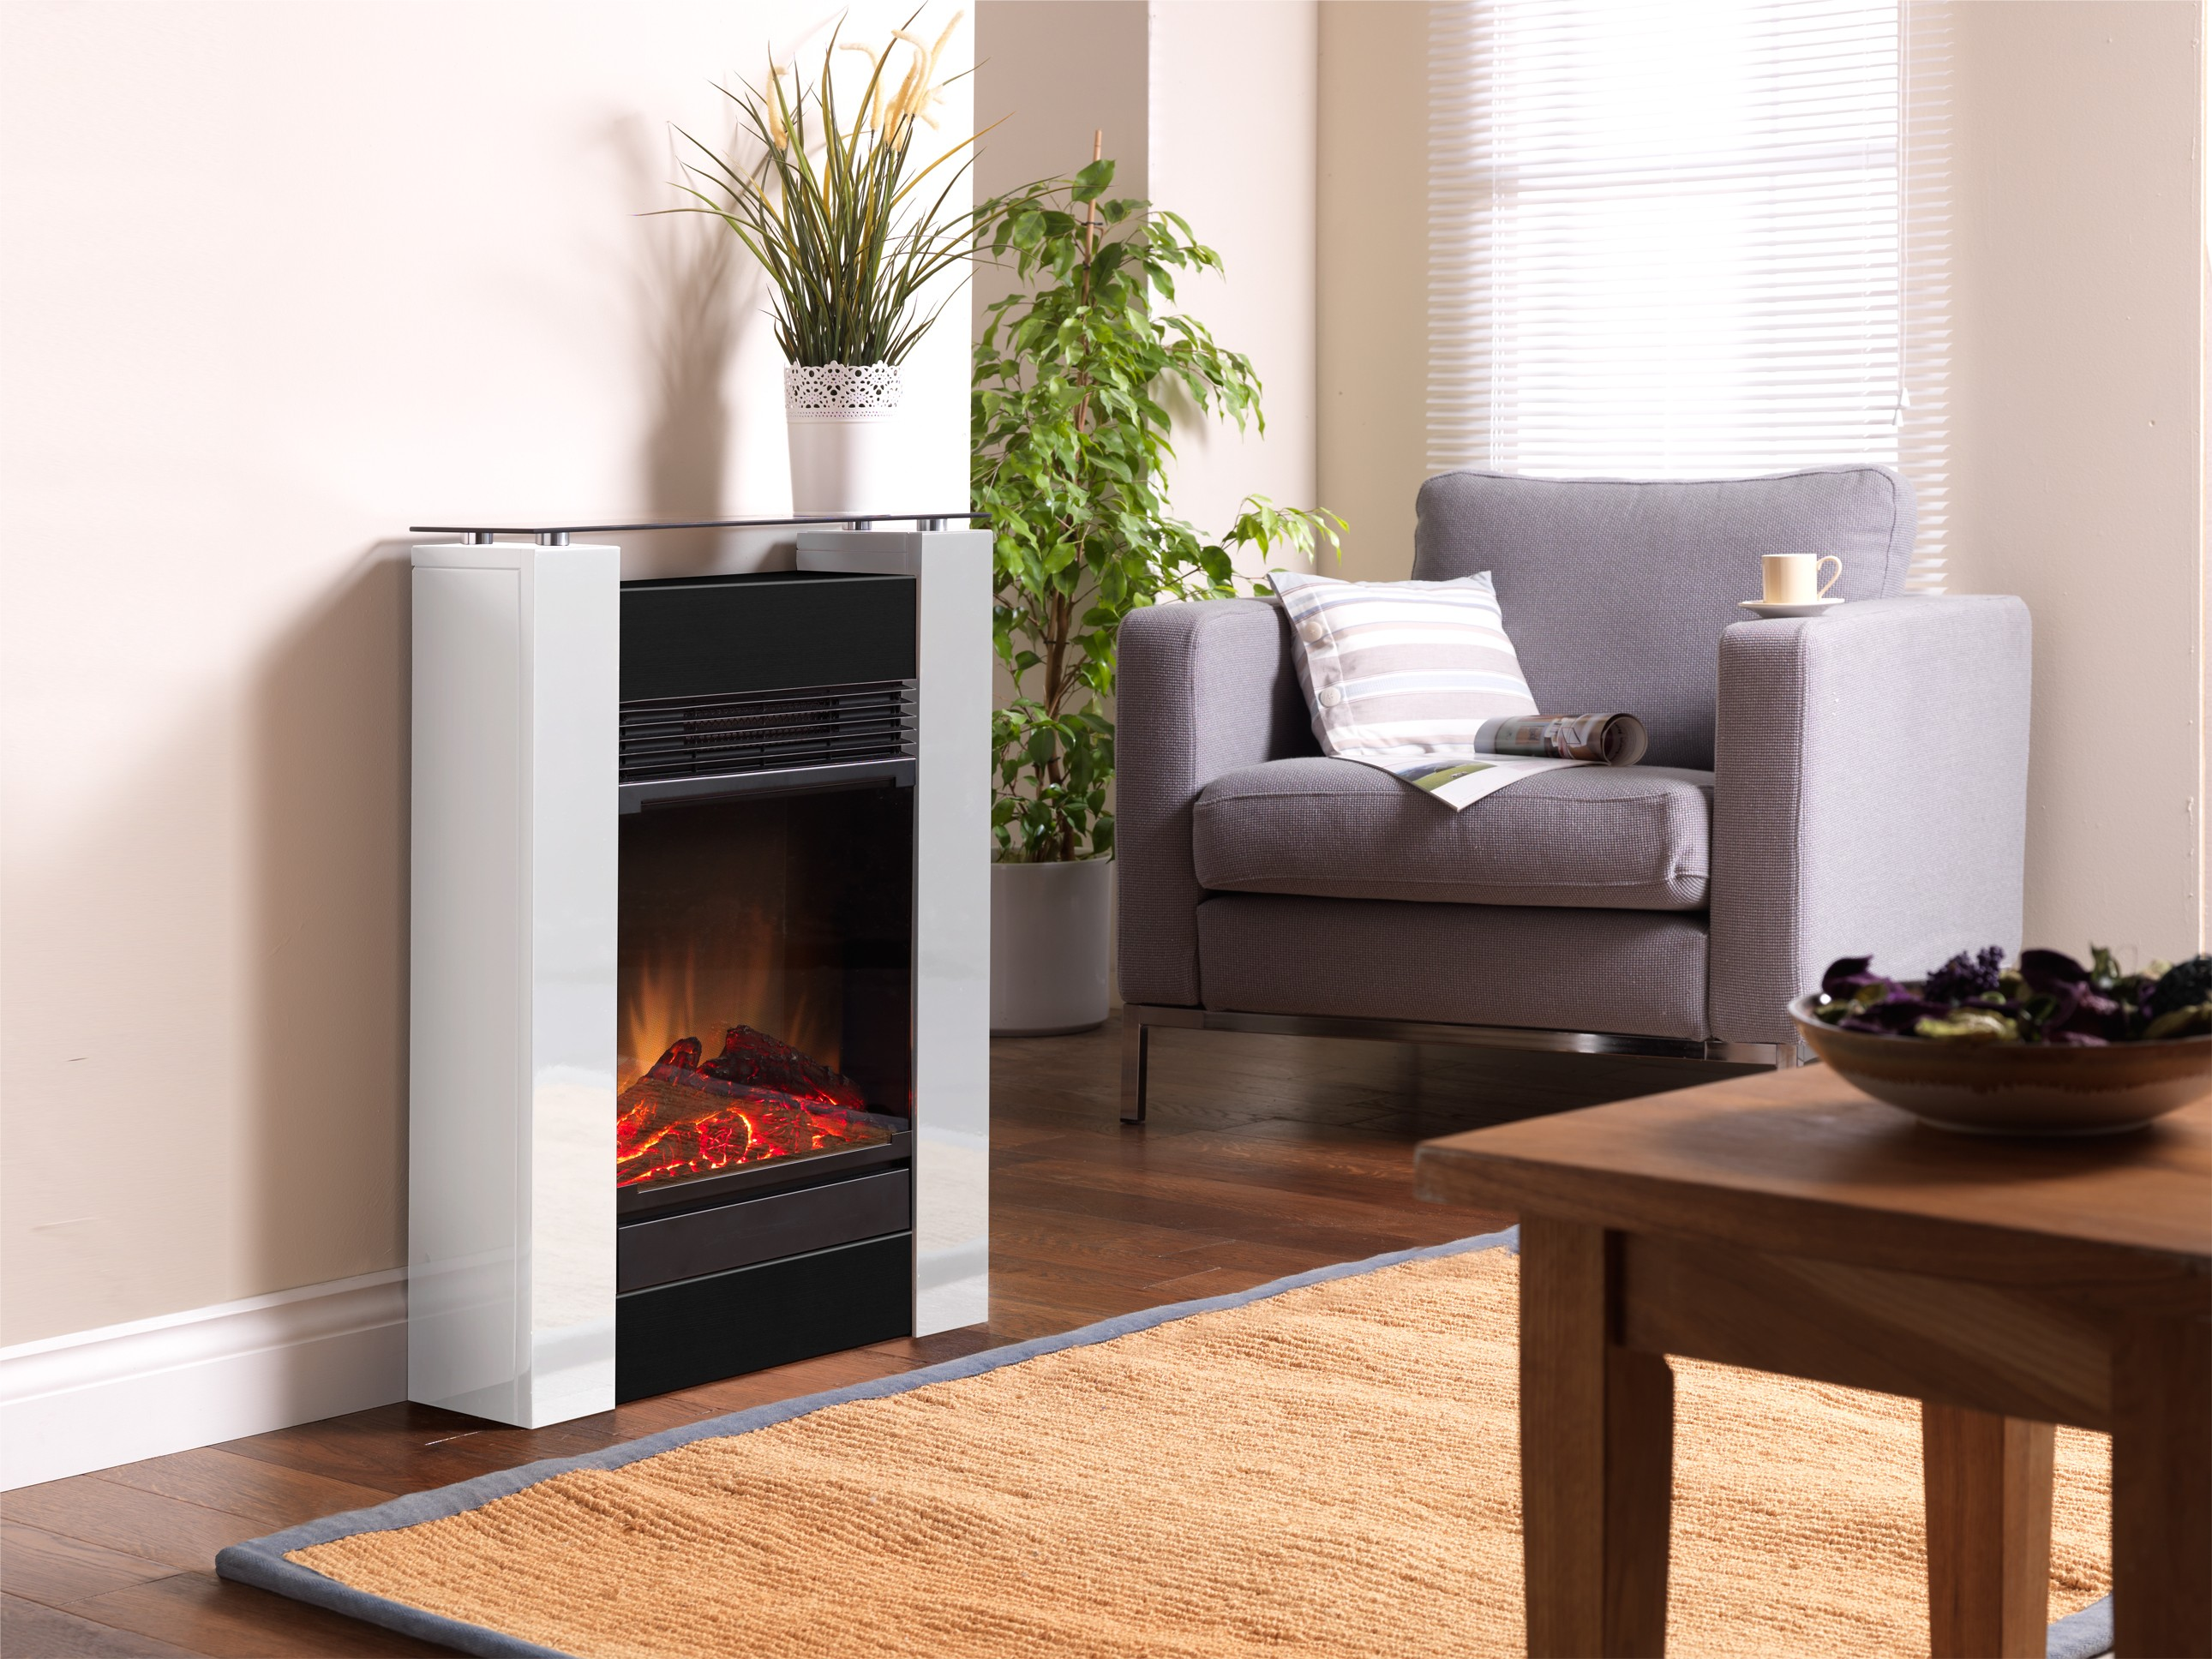 c hemin e d corative optiflame dimplex gisella blanc my. Black Bedroom Furniture Sets. Home Design Ideas